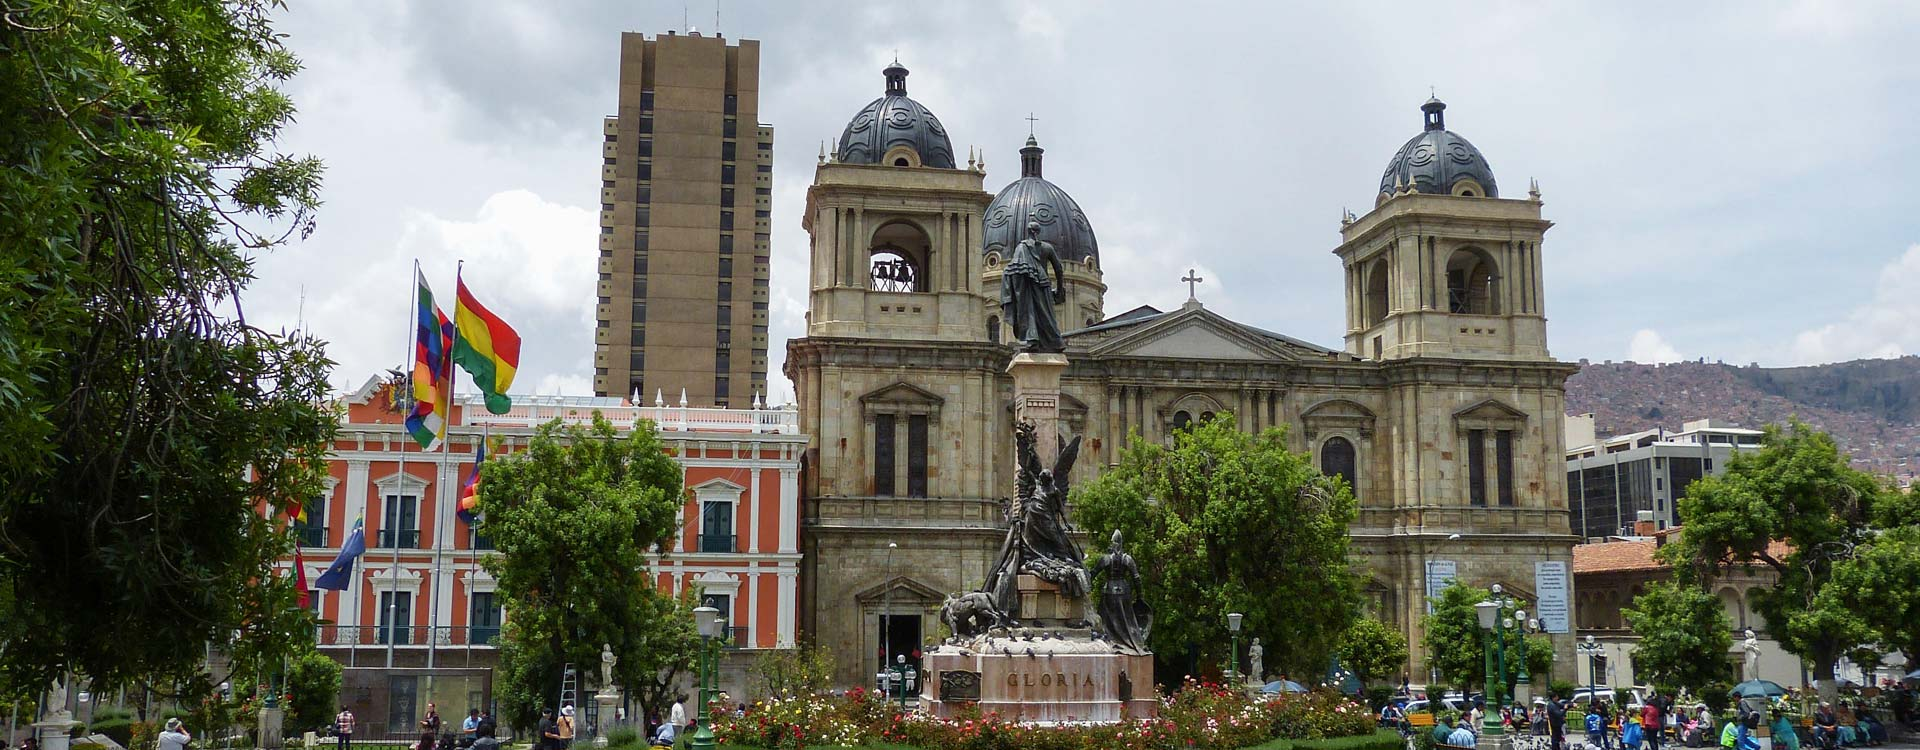 Изучение Боливии 8 Дней